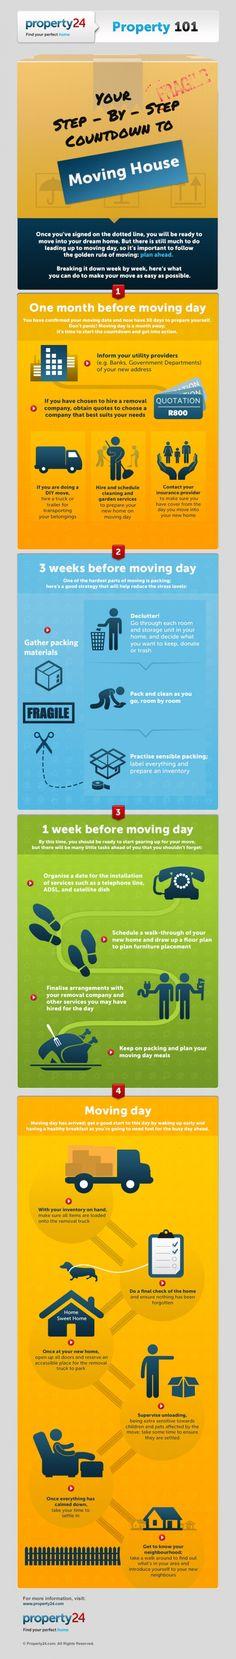 Property-24-Infographic-02-V3